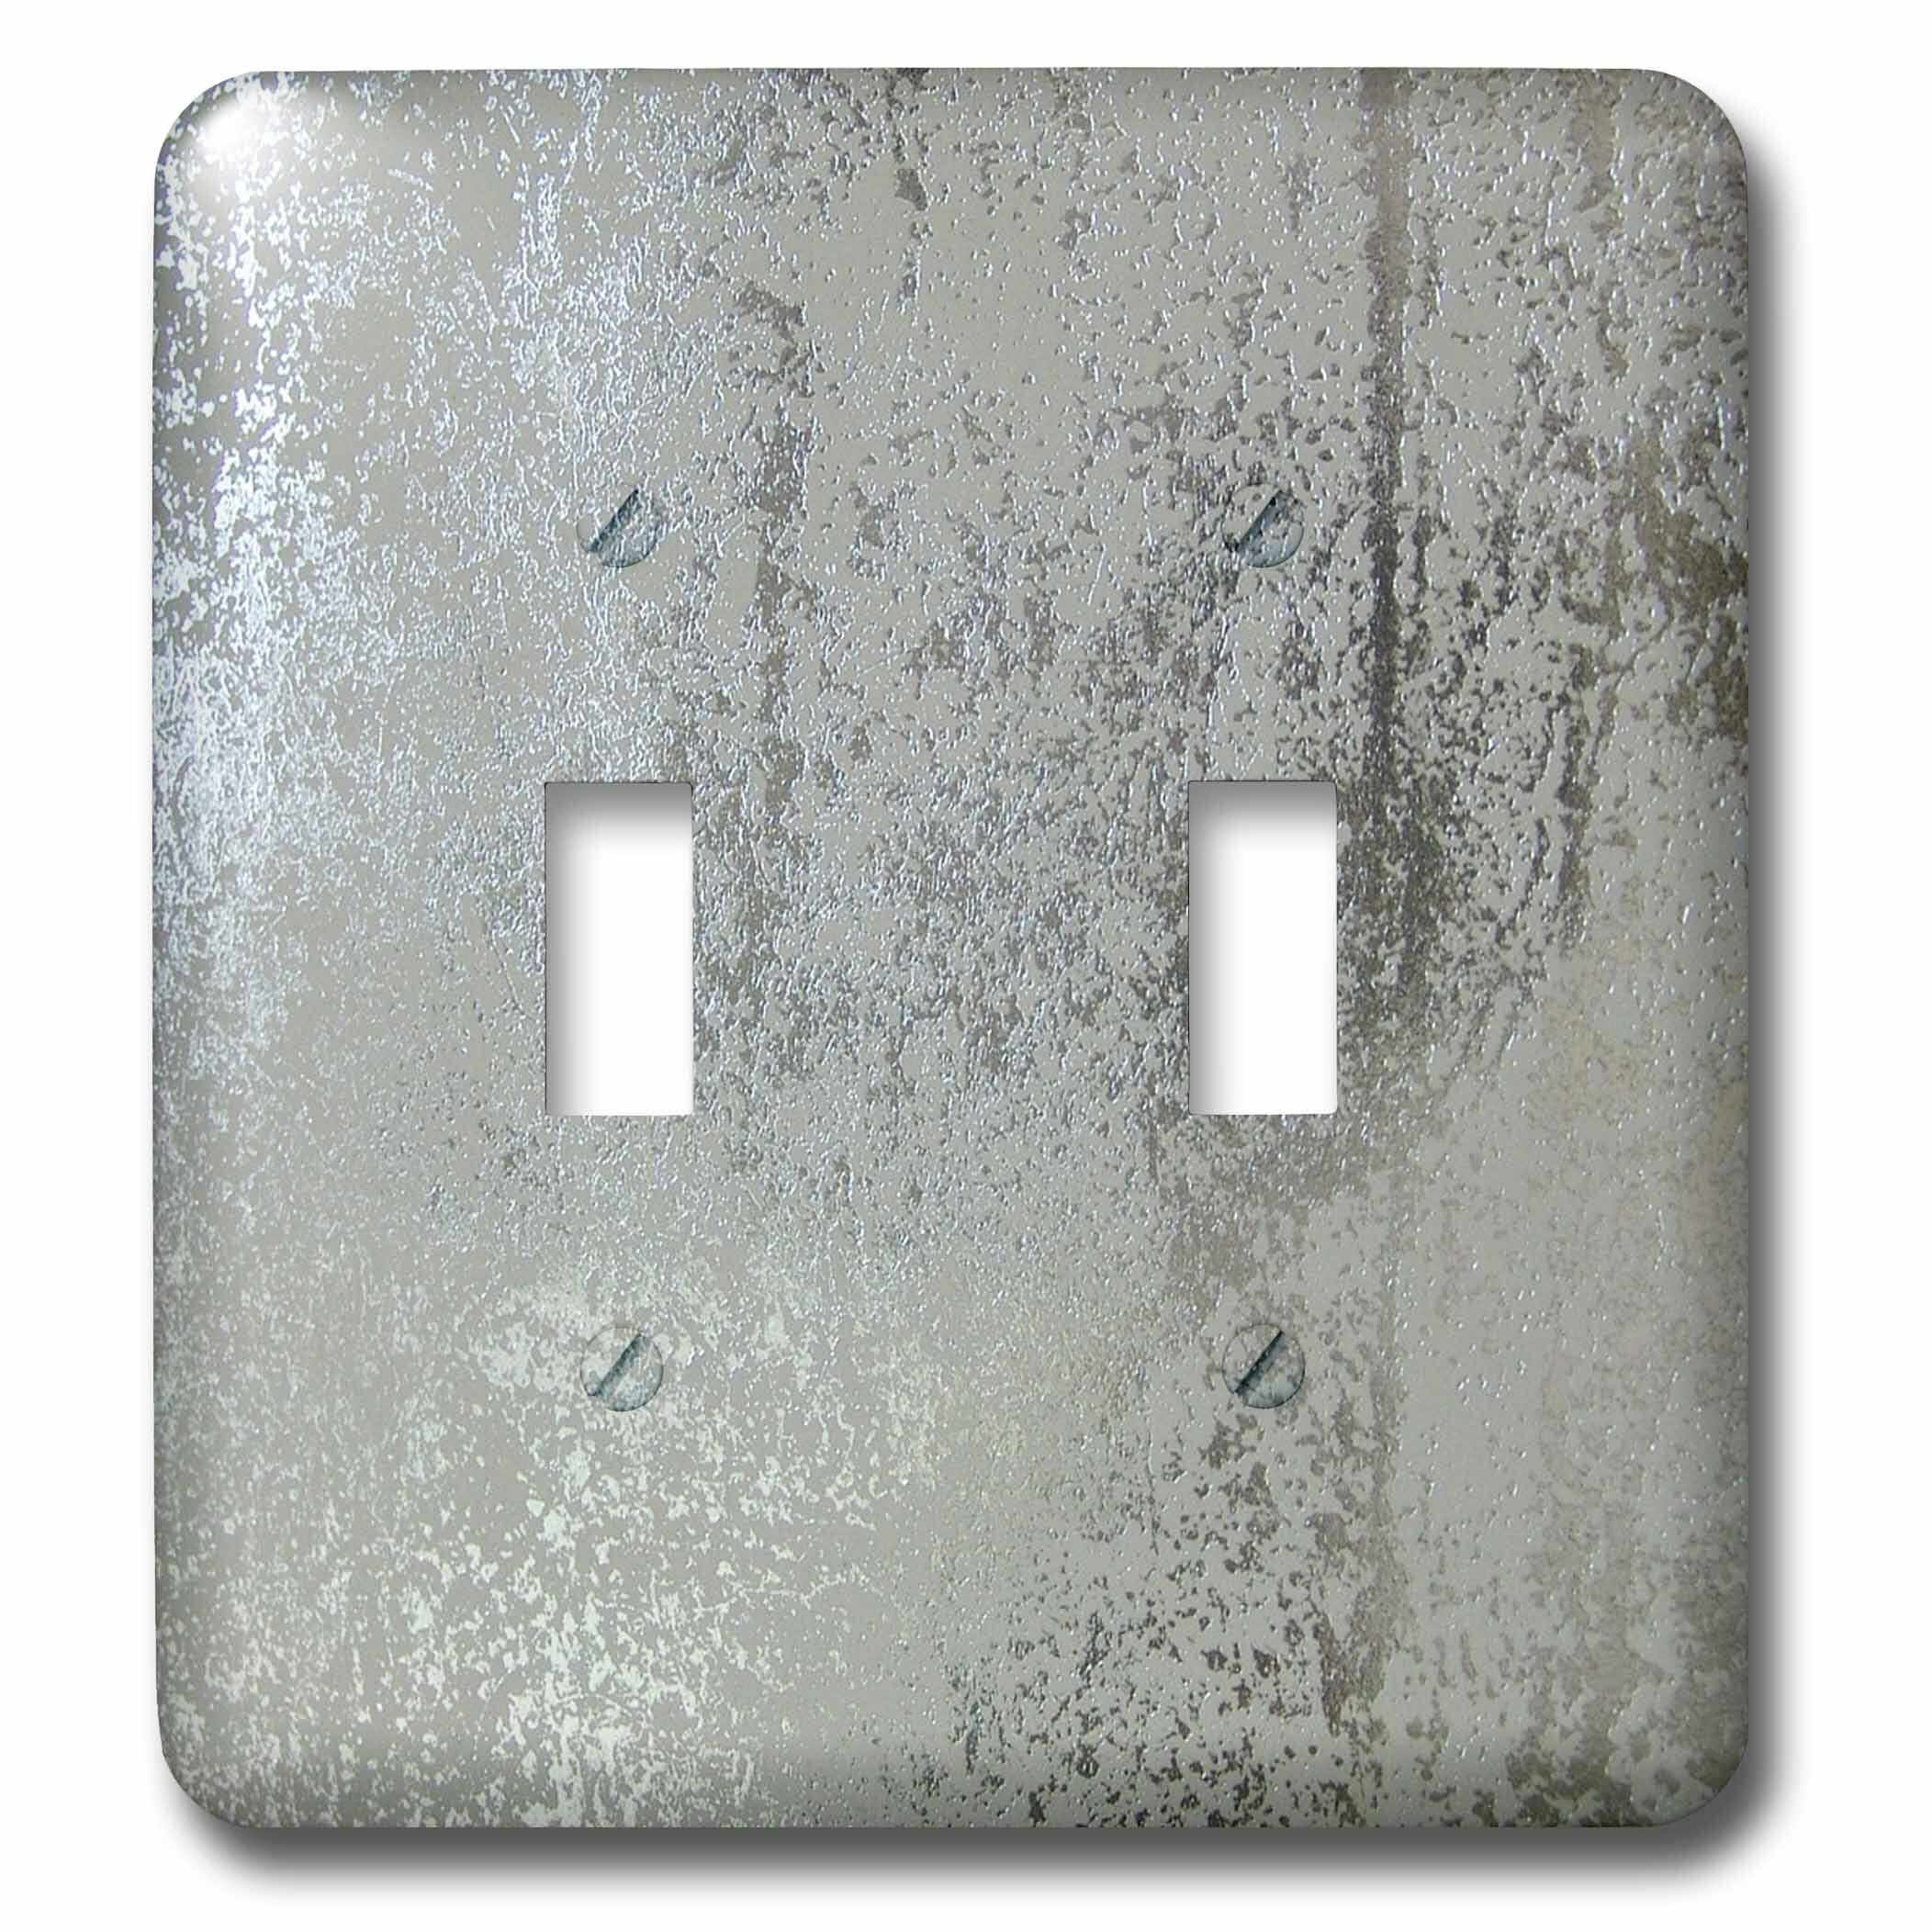 3drose Light And Darker Metallic Silver 2 Gang Toggle Light Switch Wall Plate Wayfair